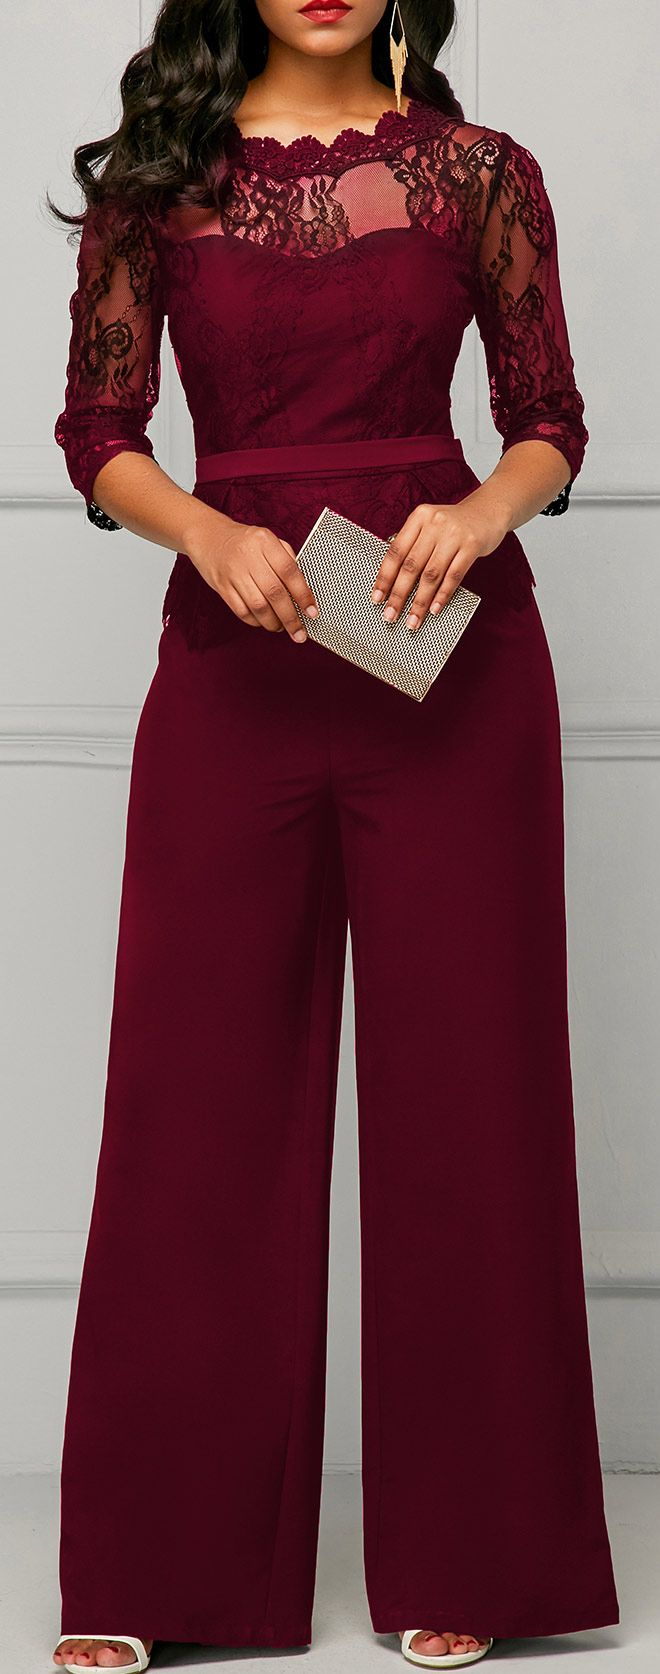 Peplum Waist Lace Panel Burgundy Jumpsuit.